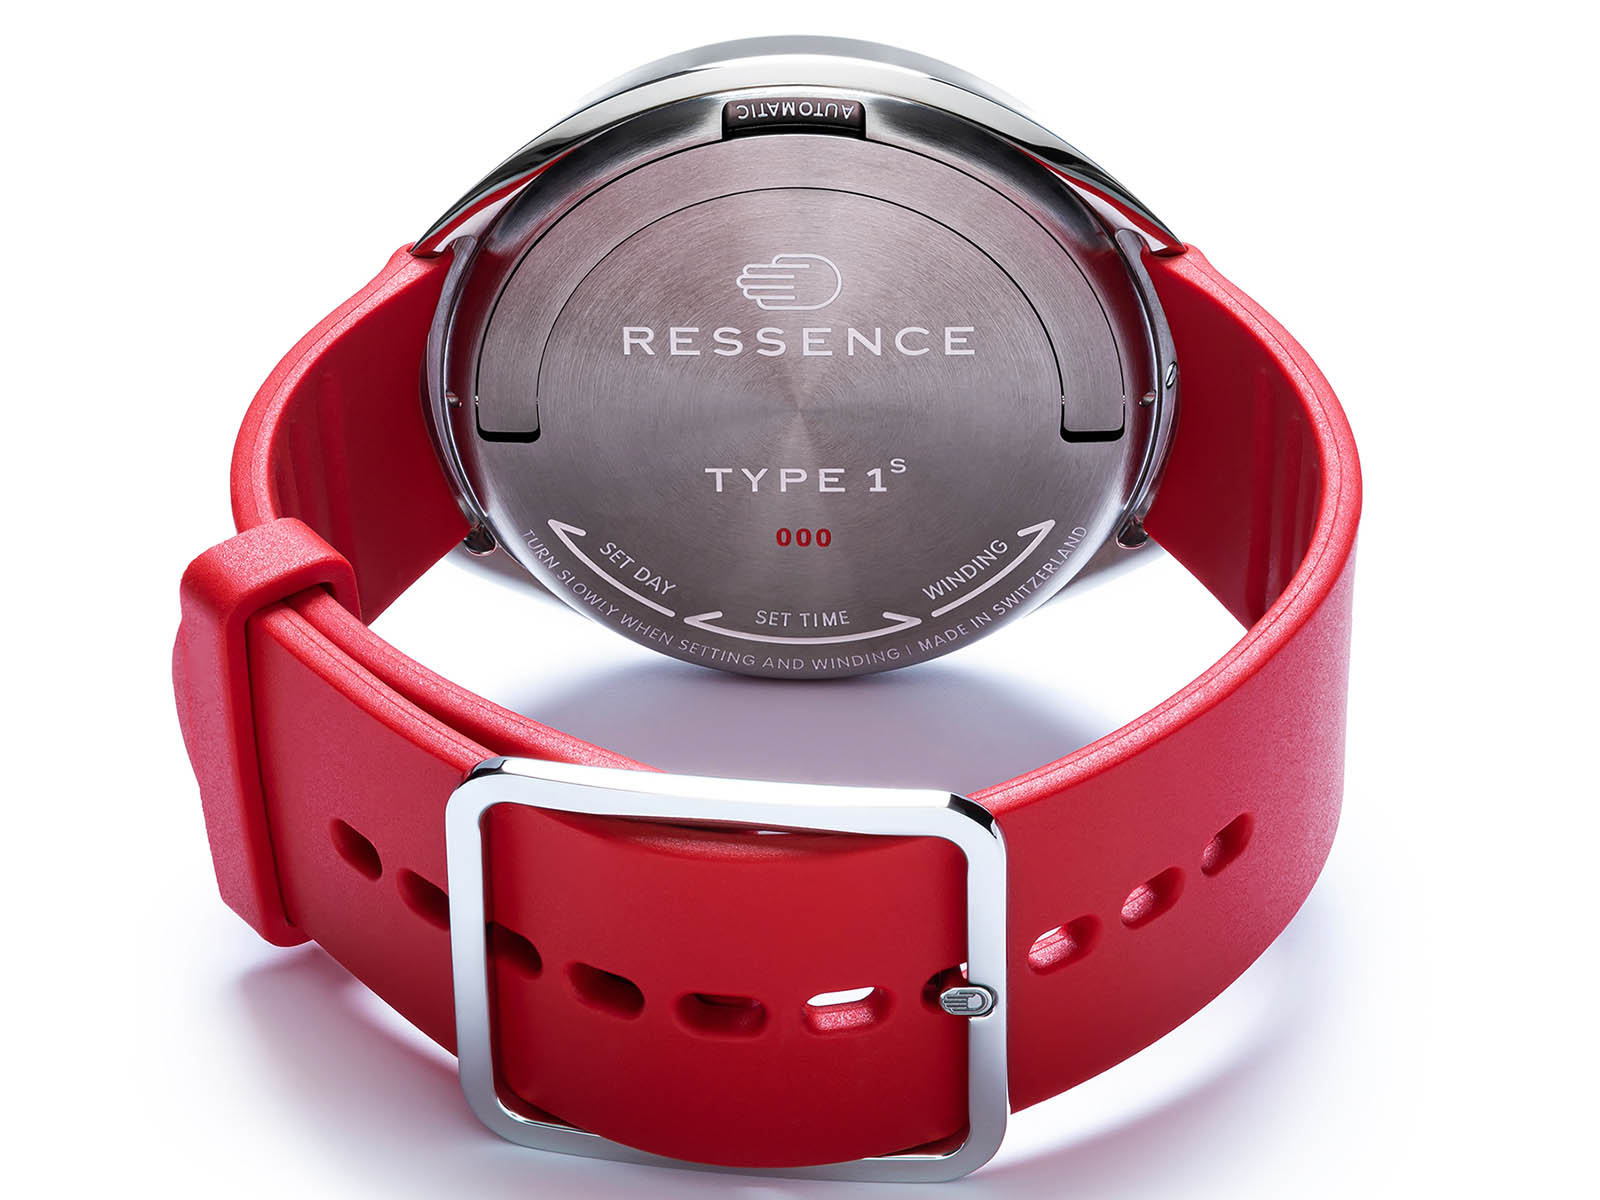 ressence-type-1-slim-red-8.jpg